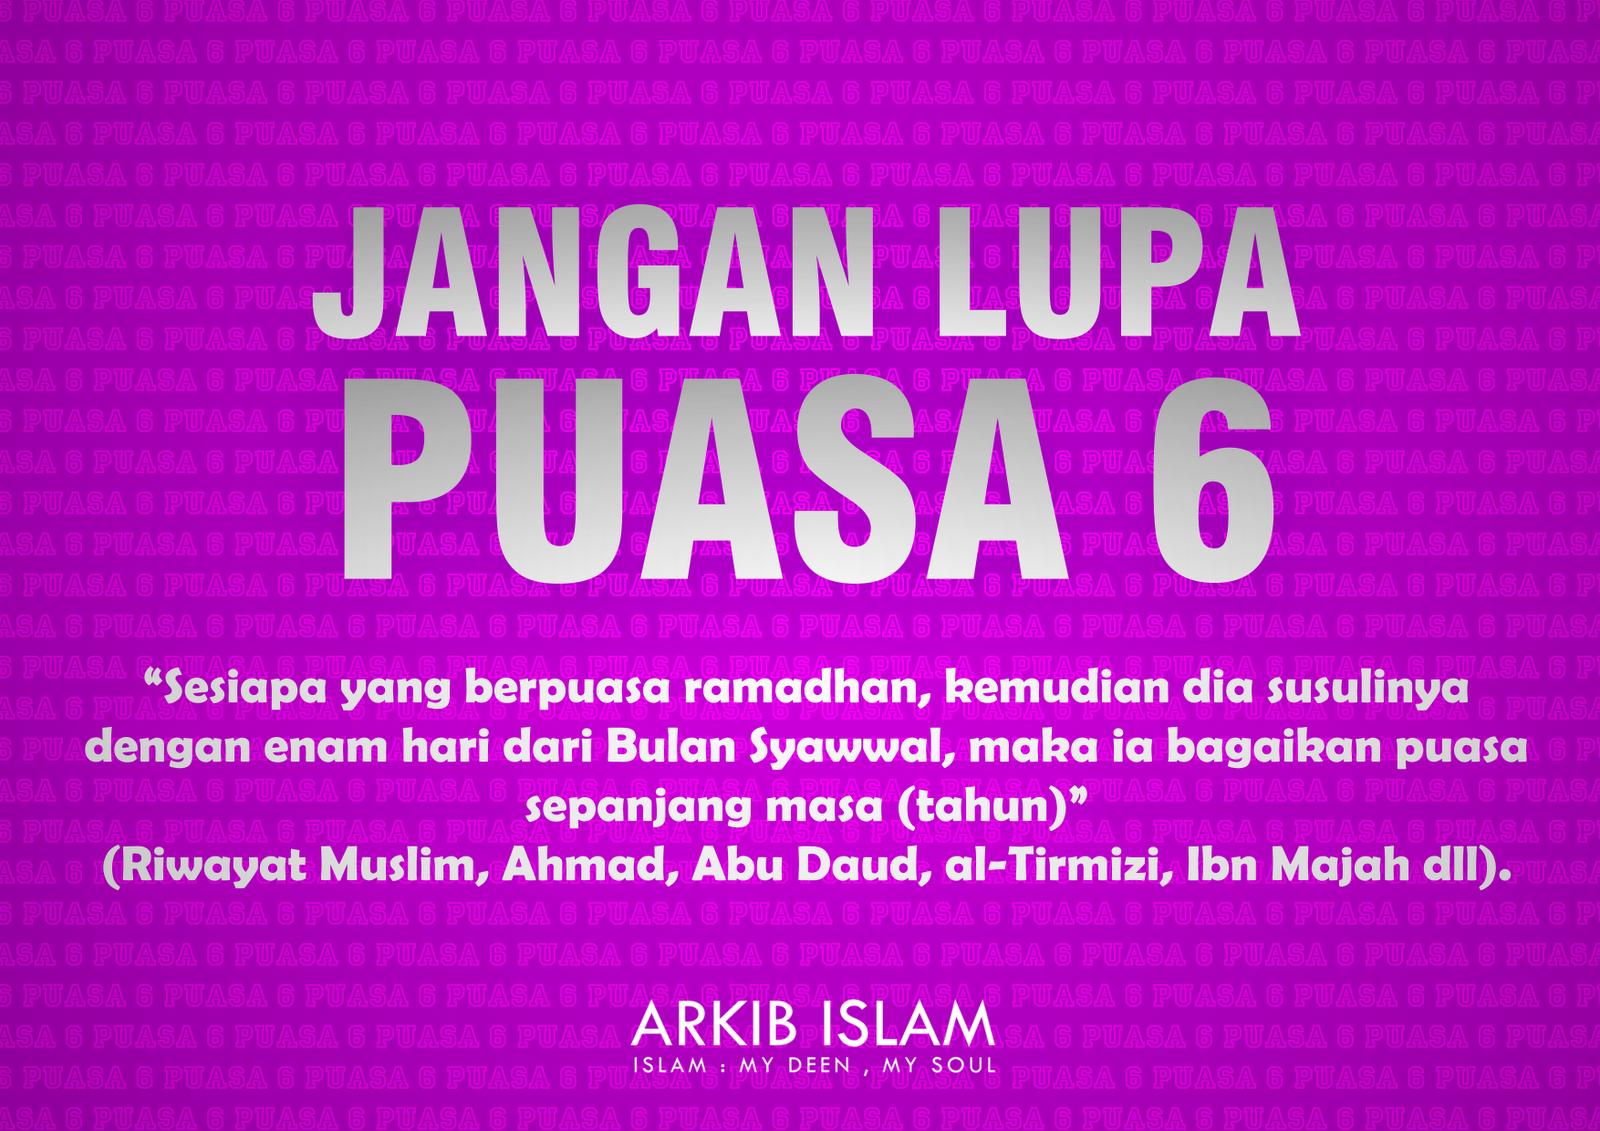 Jadwal Buka Puasa Ramadhan 2019,2020| Imsakiyah, Buka dan Sahur